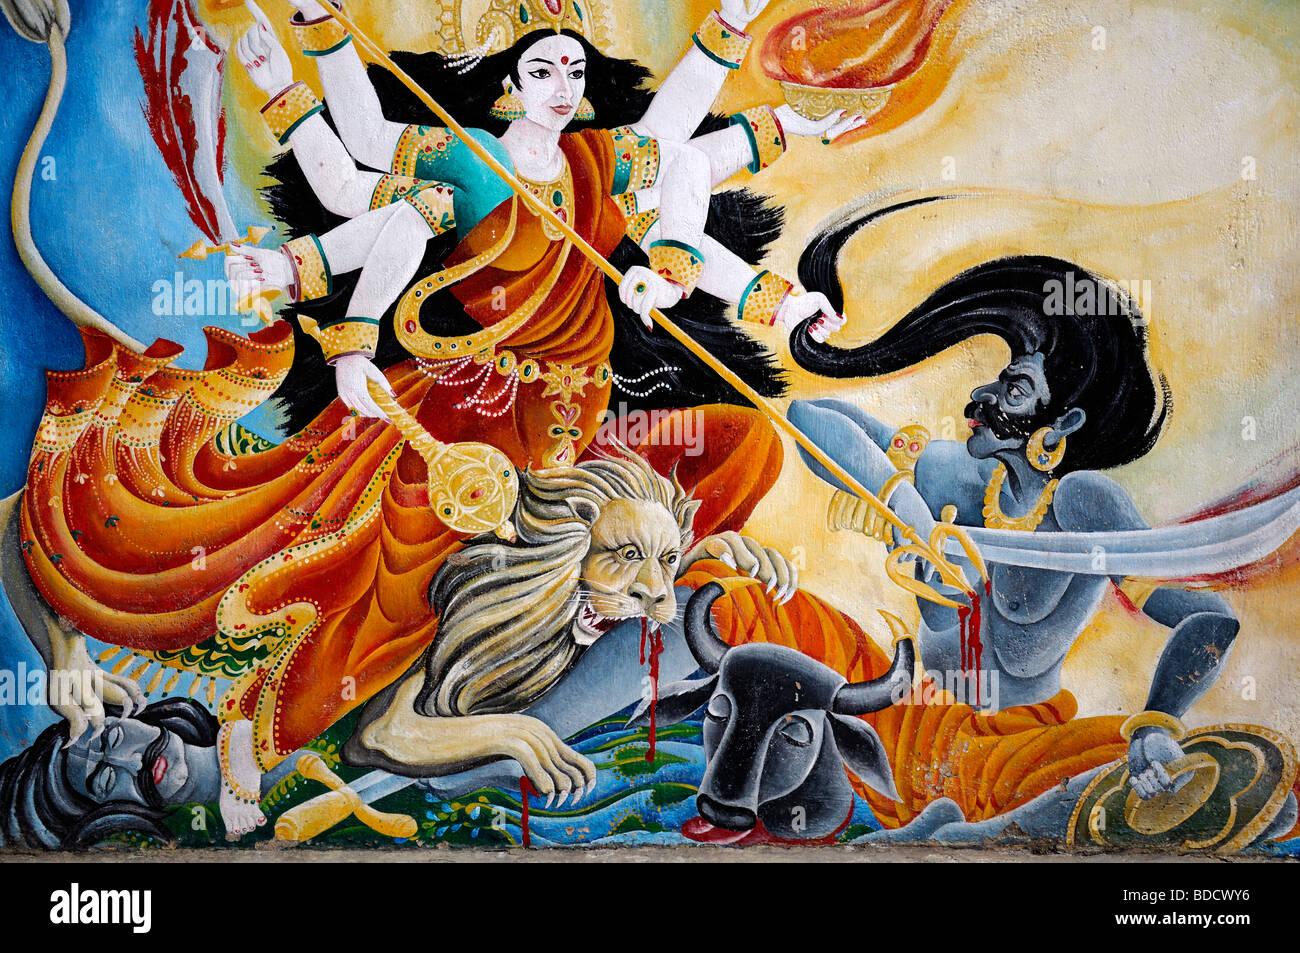 color colourful painting mural depicting shiva as a warrior hindu hindi god deity pashupatinath temple nepal Stock Photo